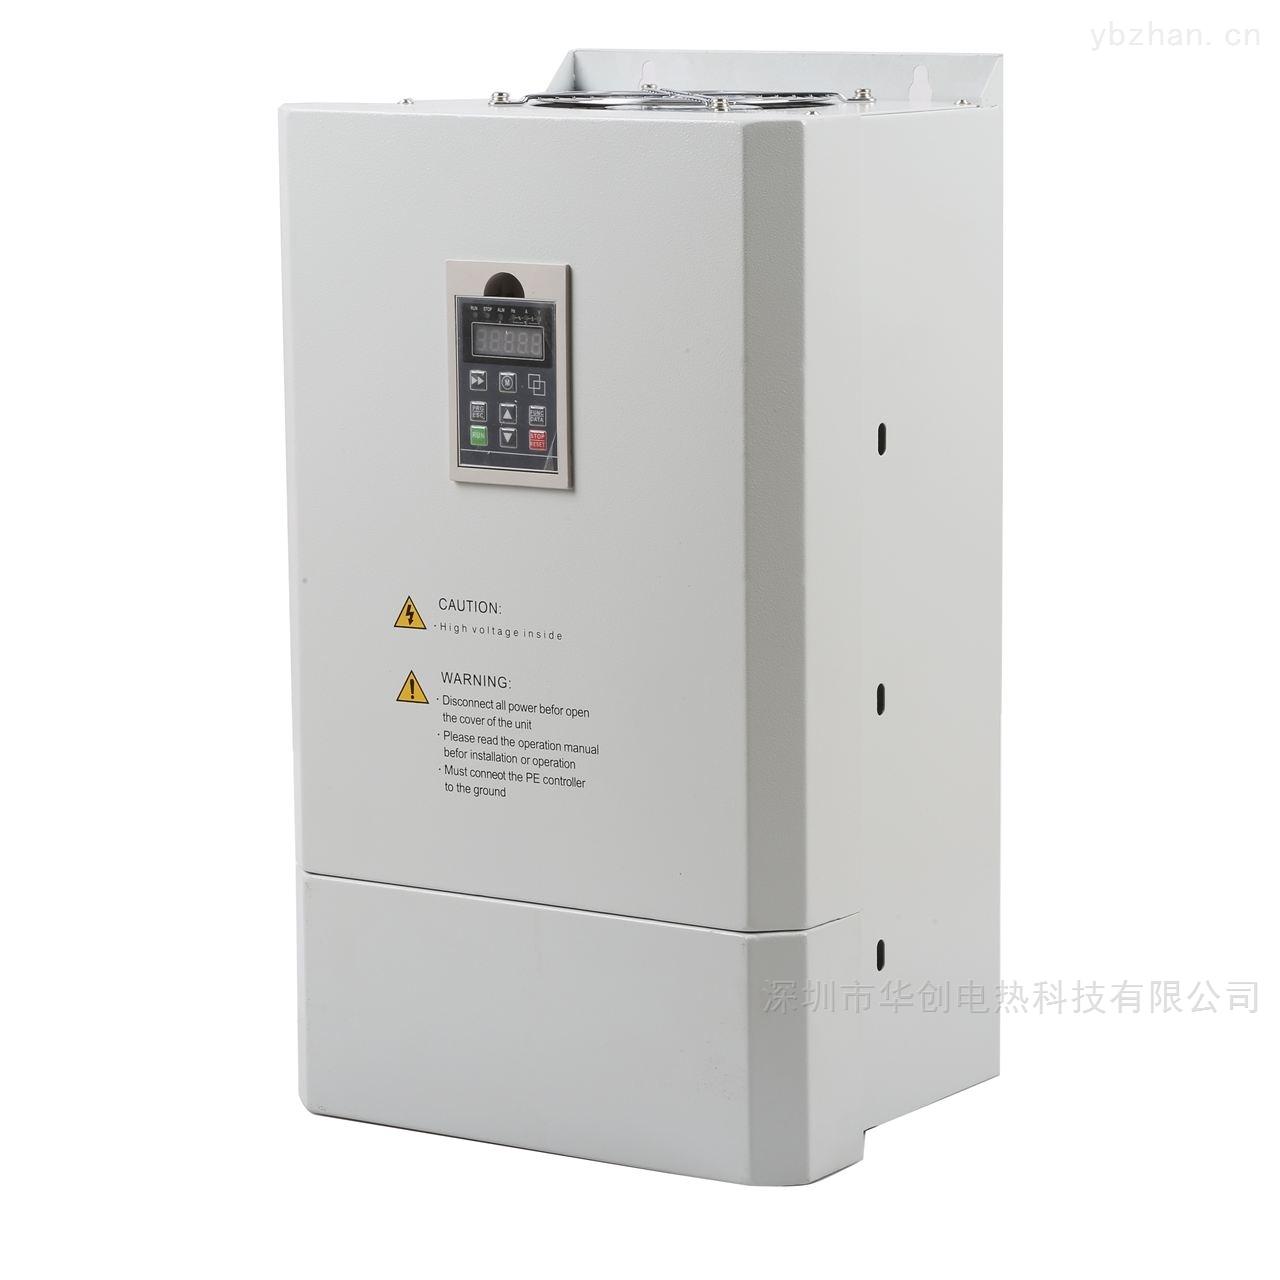 HCDRE-60KW-热风炉电磁加热器